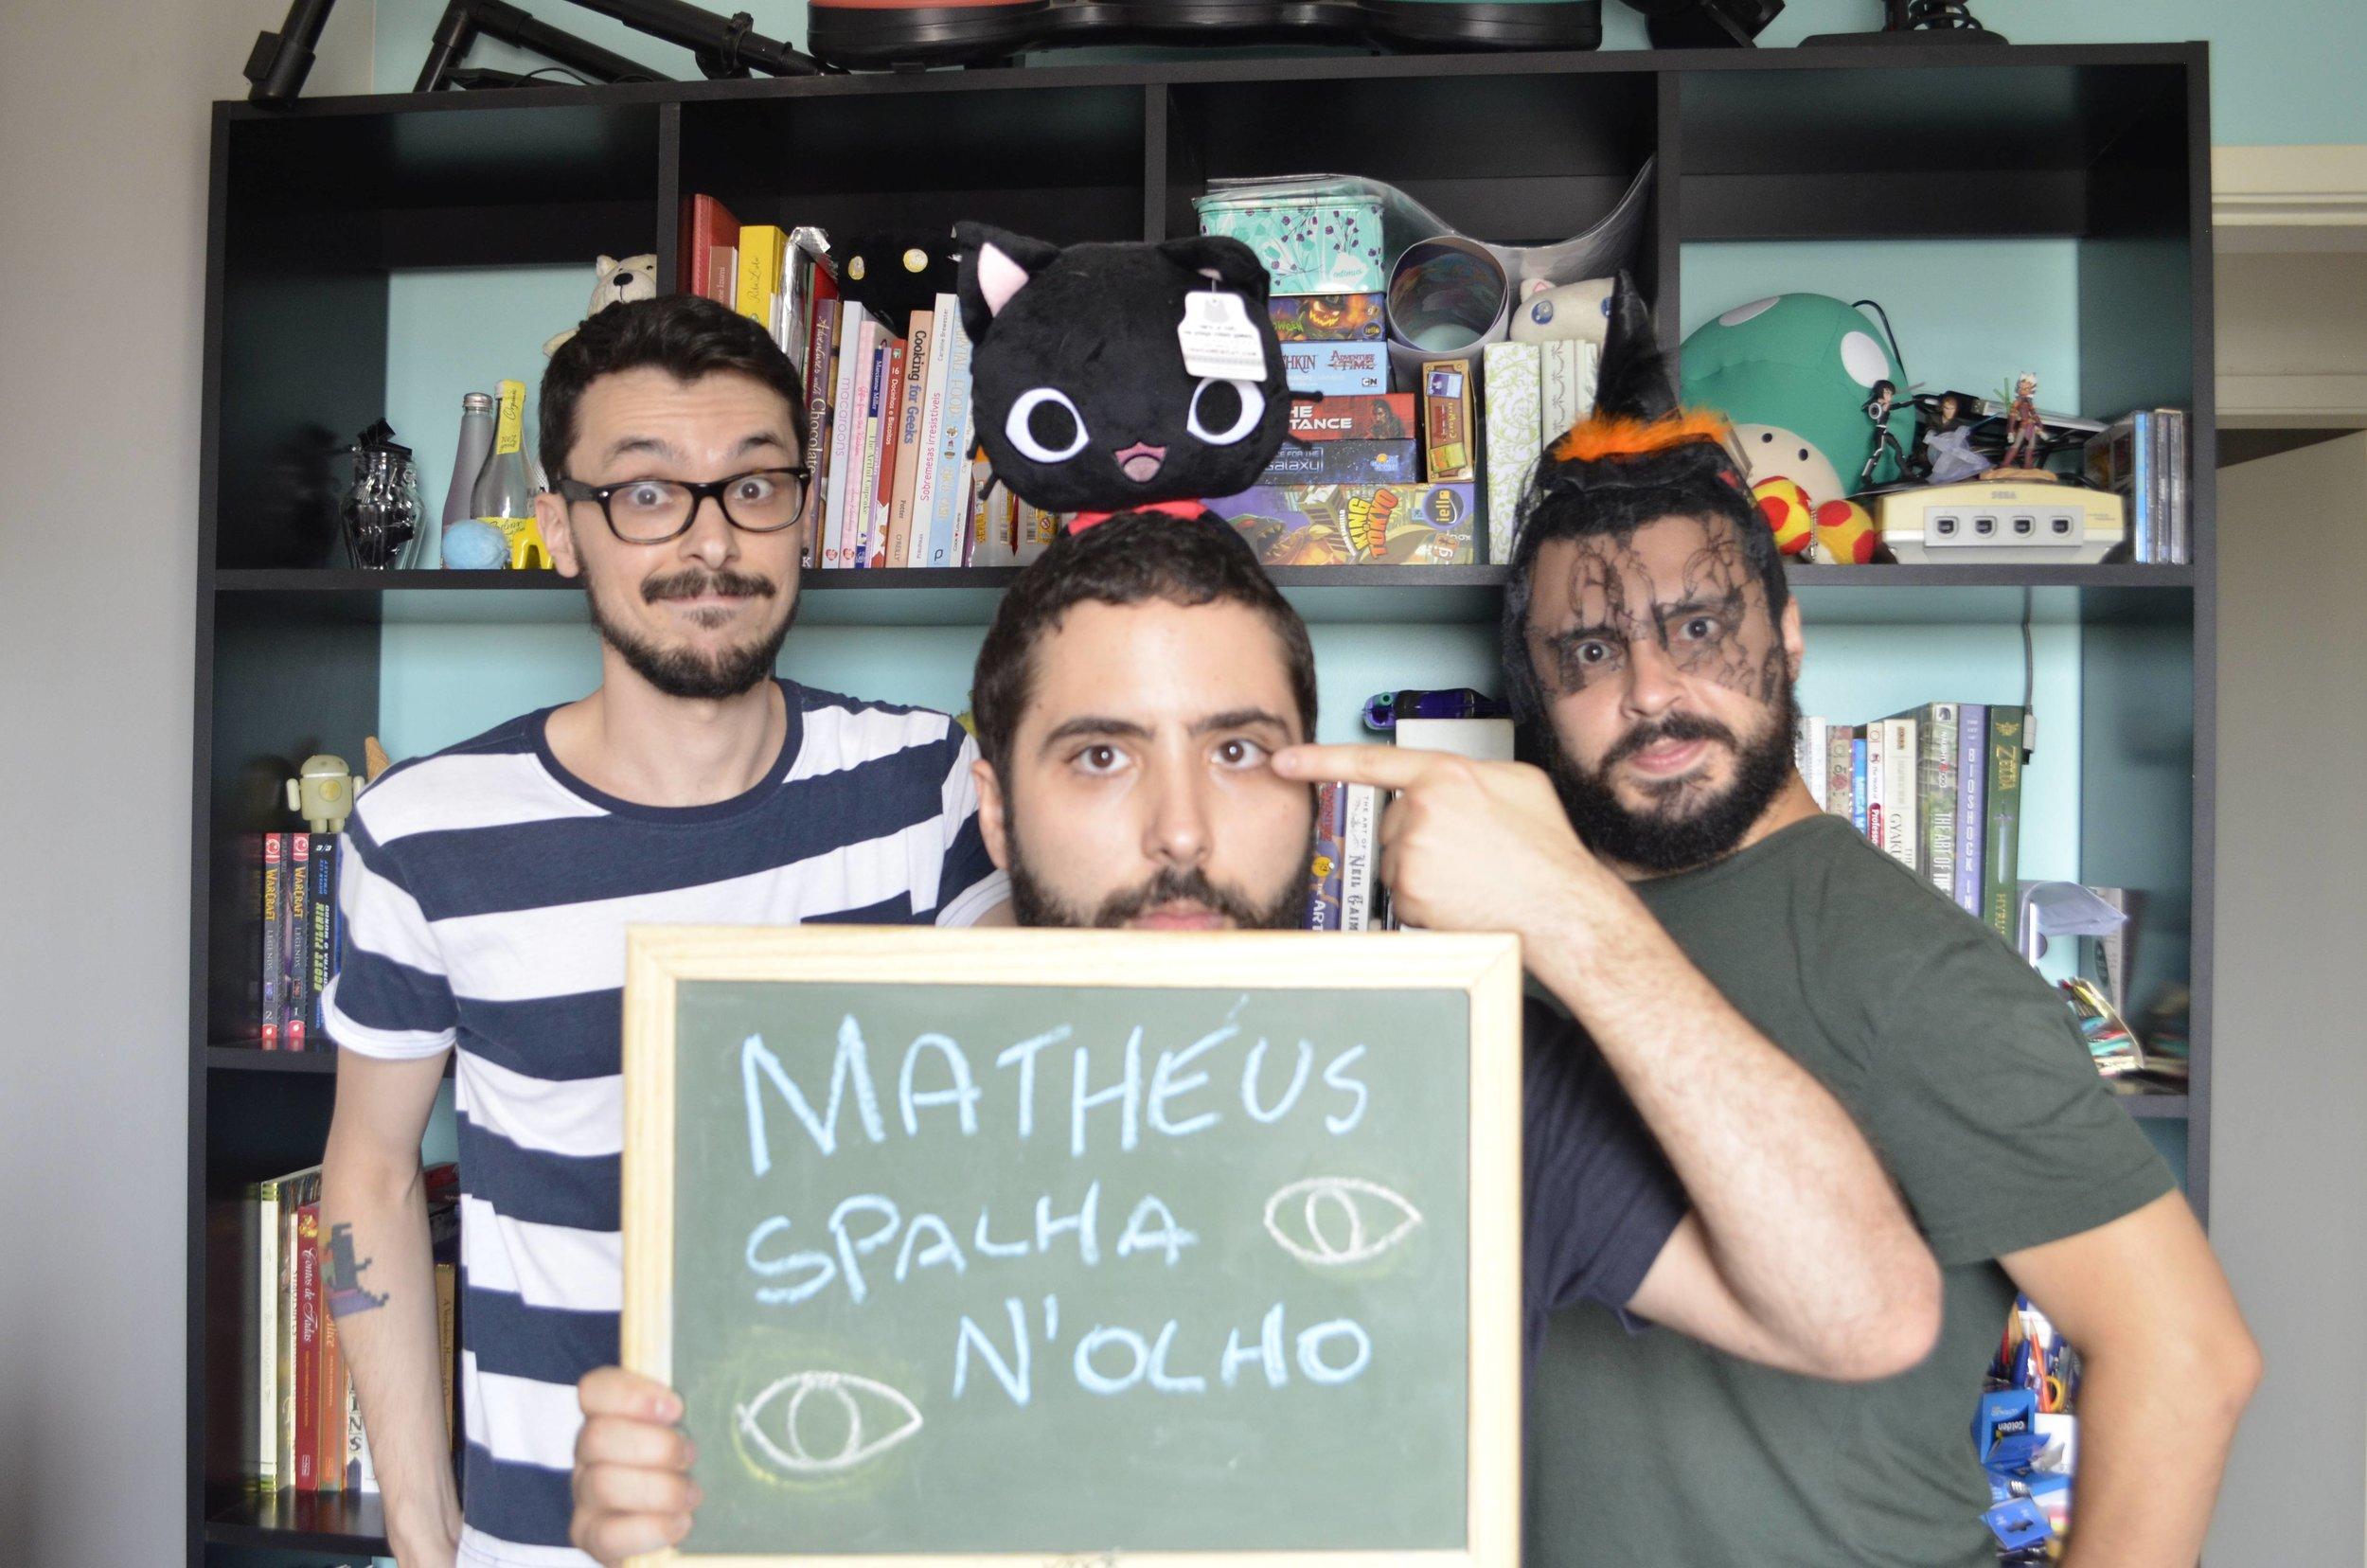 Matheus-Spagnioli.jpg